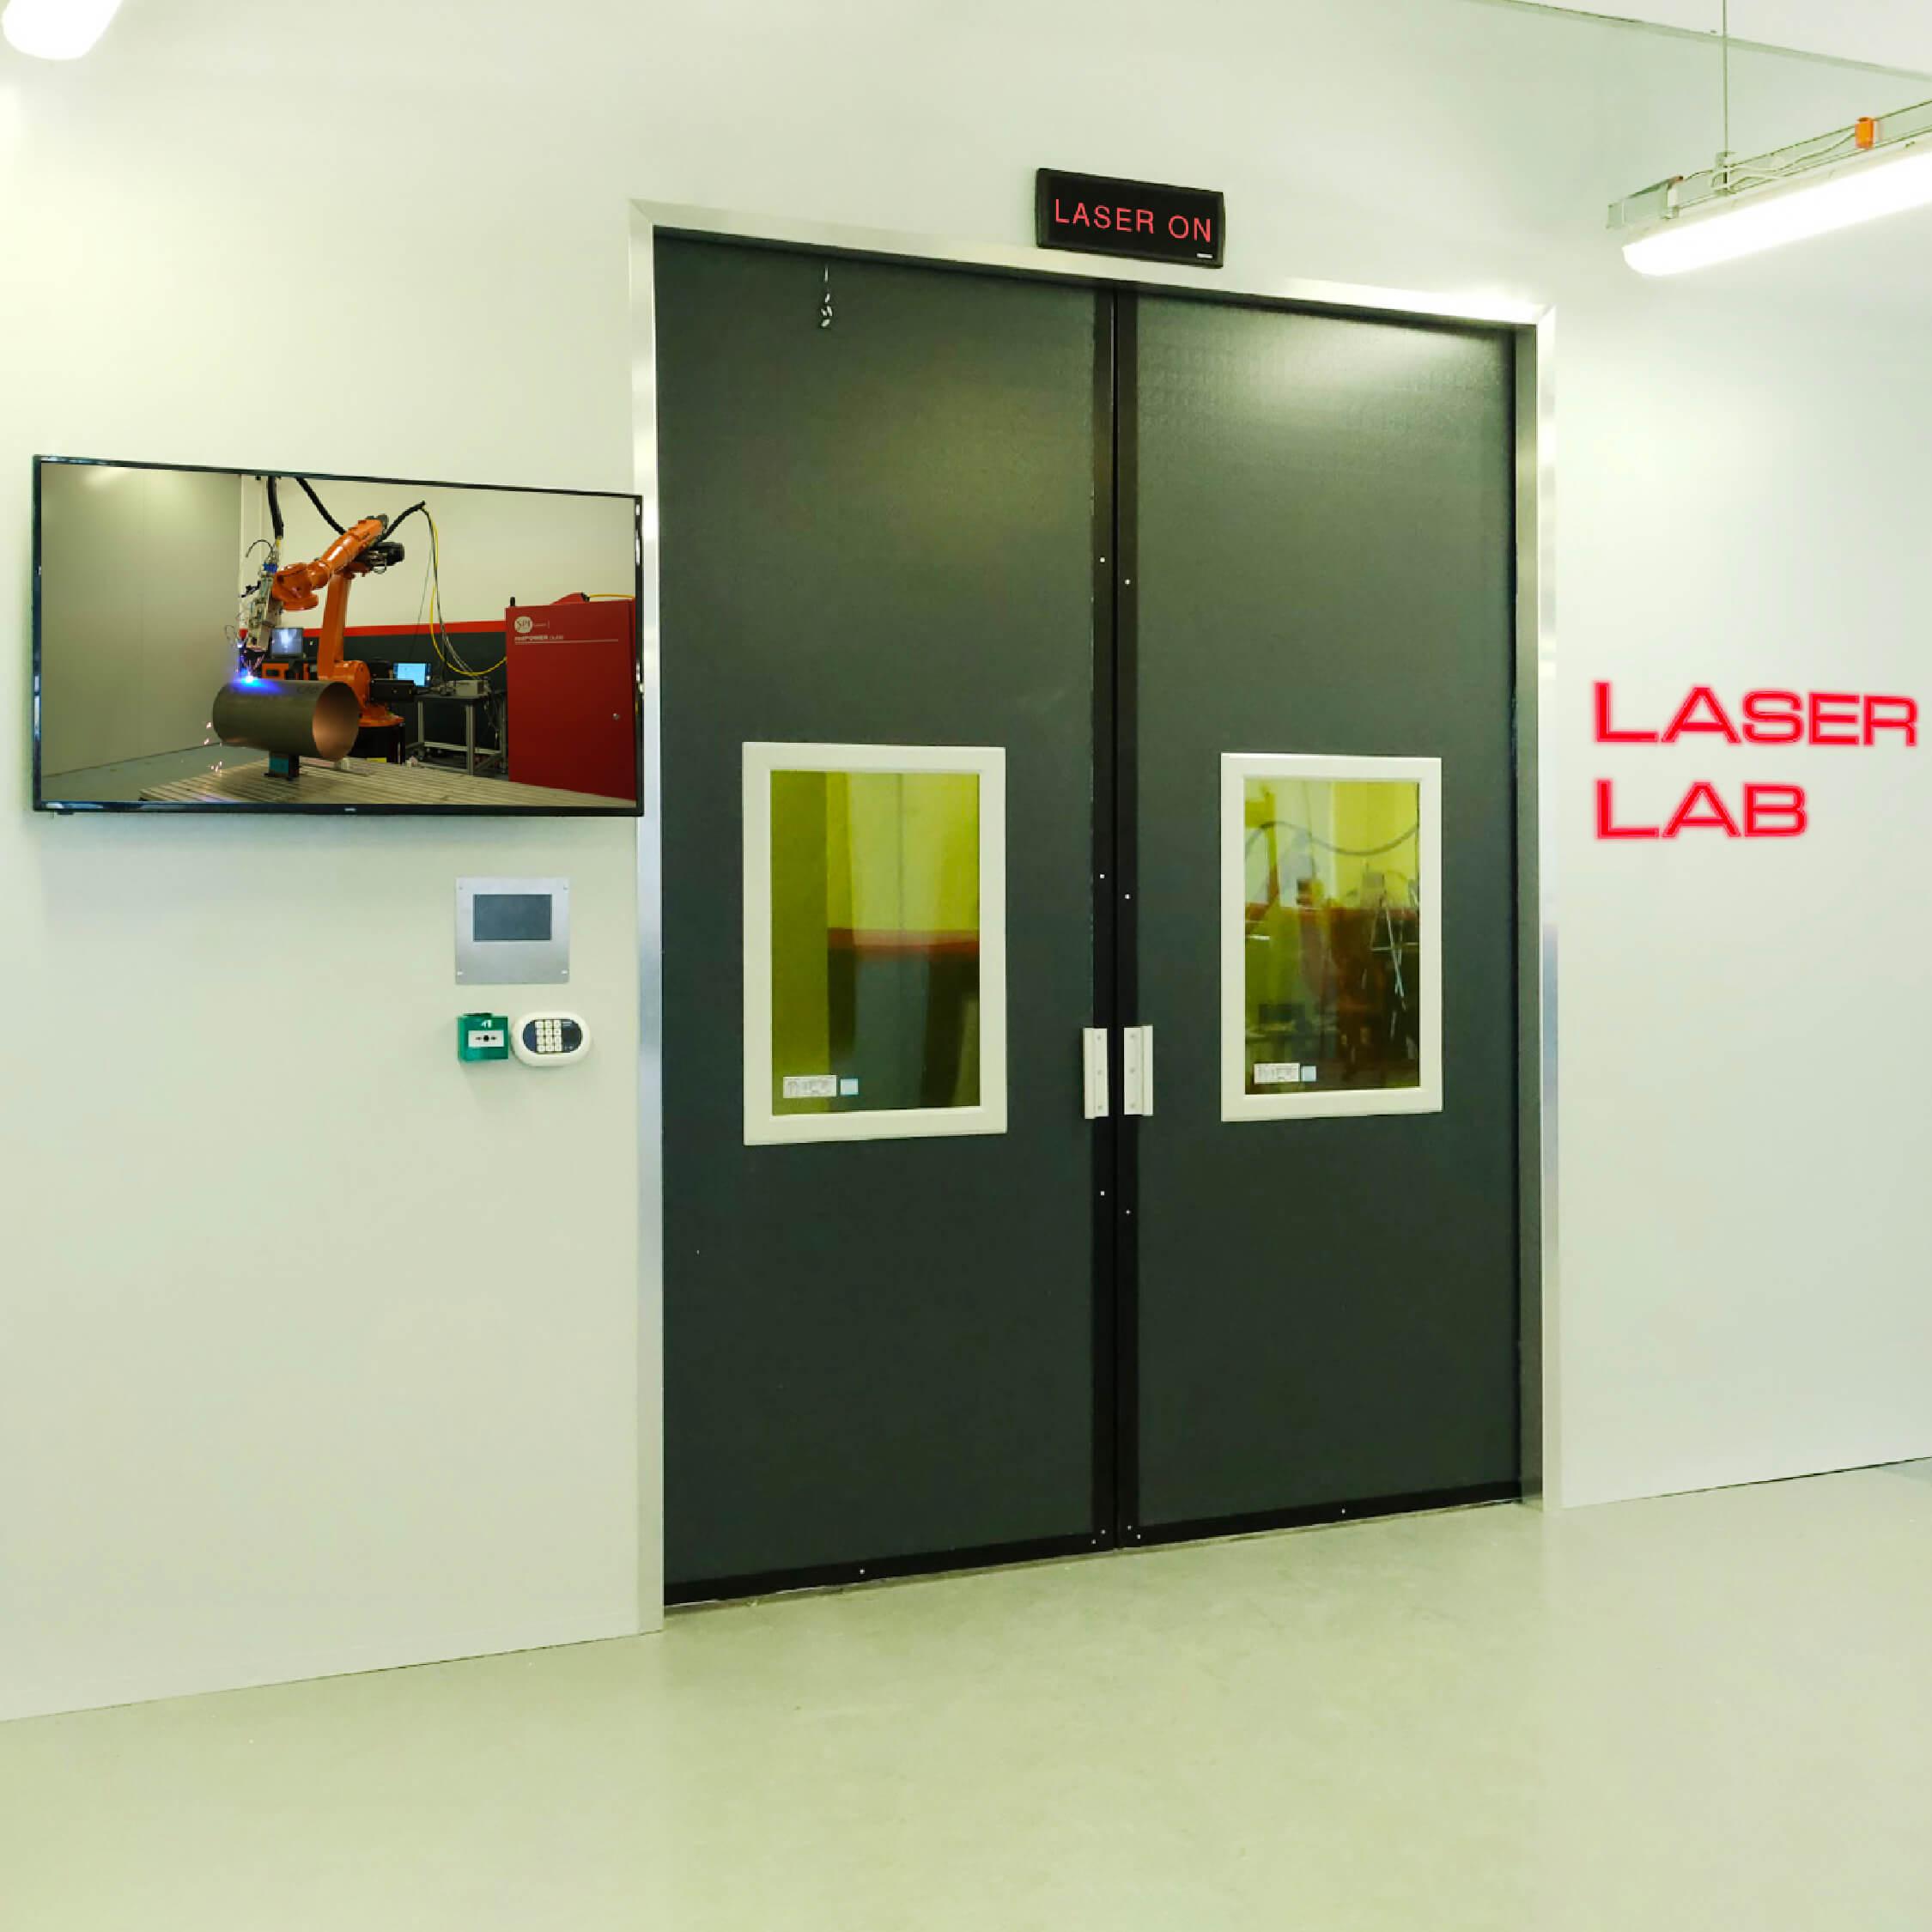 Laser Isse Lazer Laboratuvari Blog